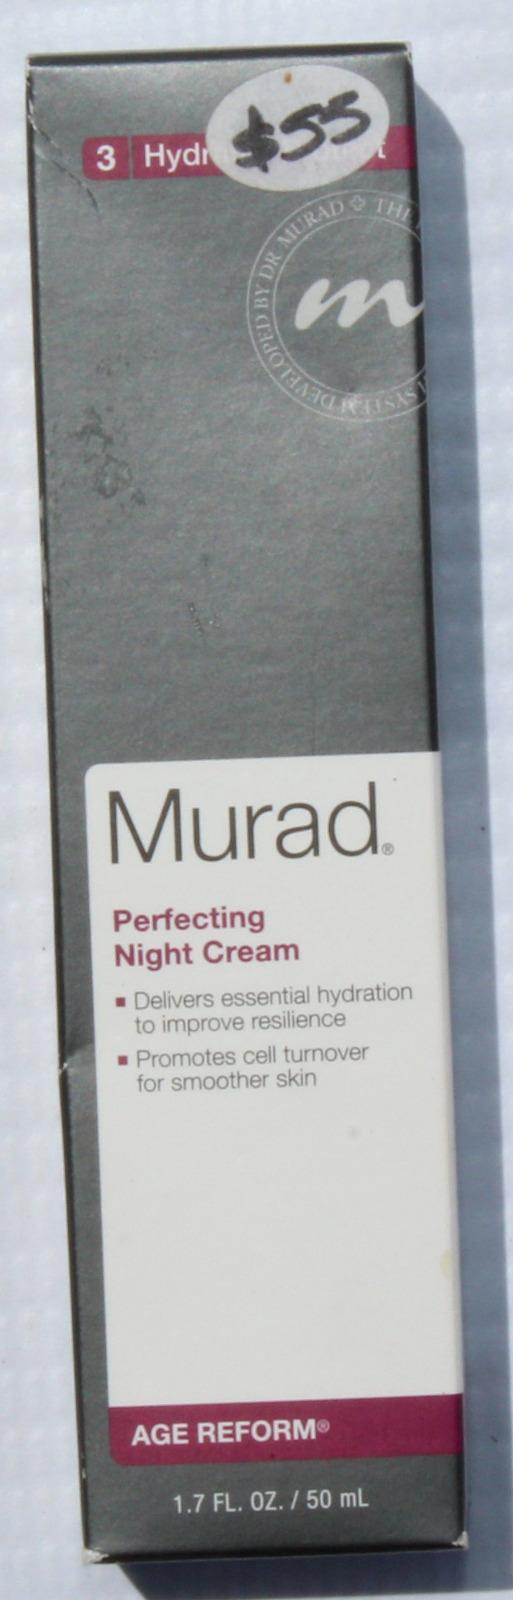 Perfecting Night Cream